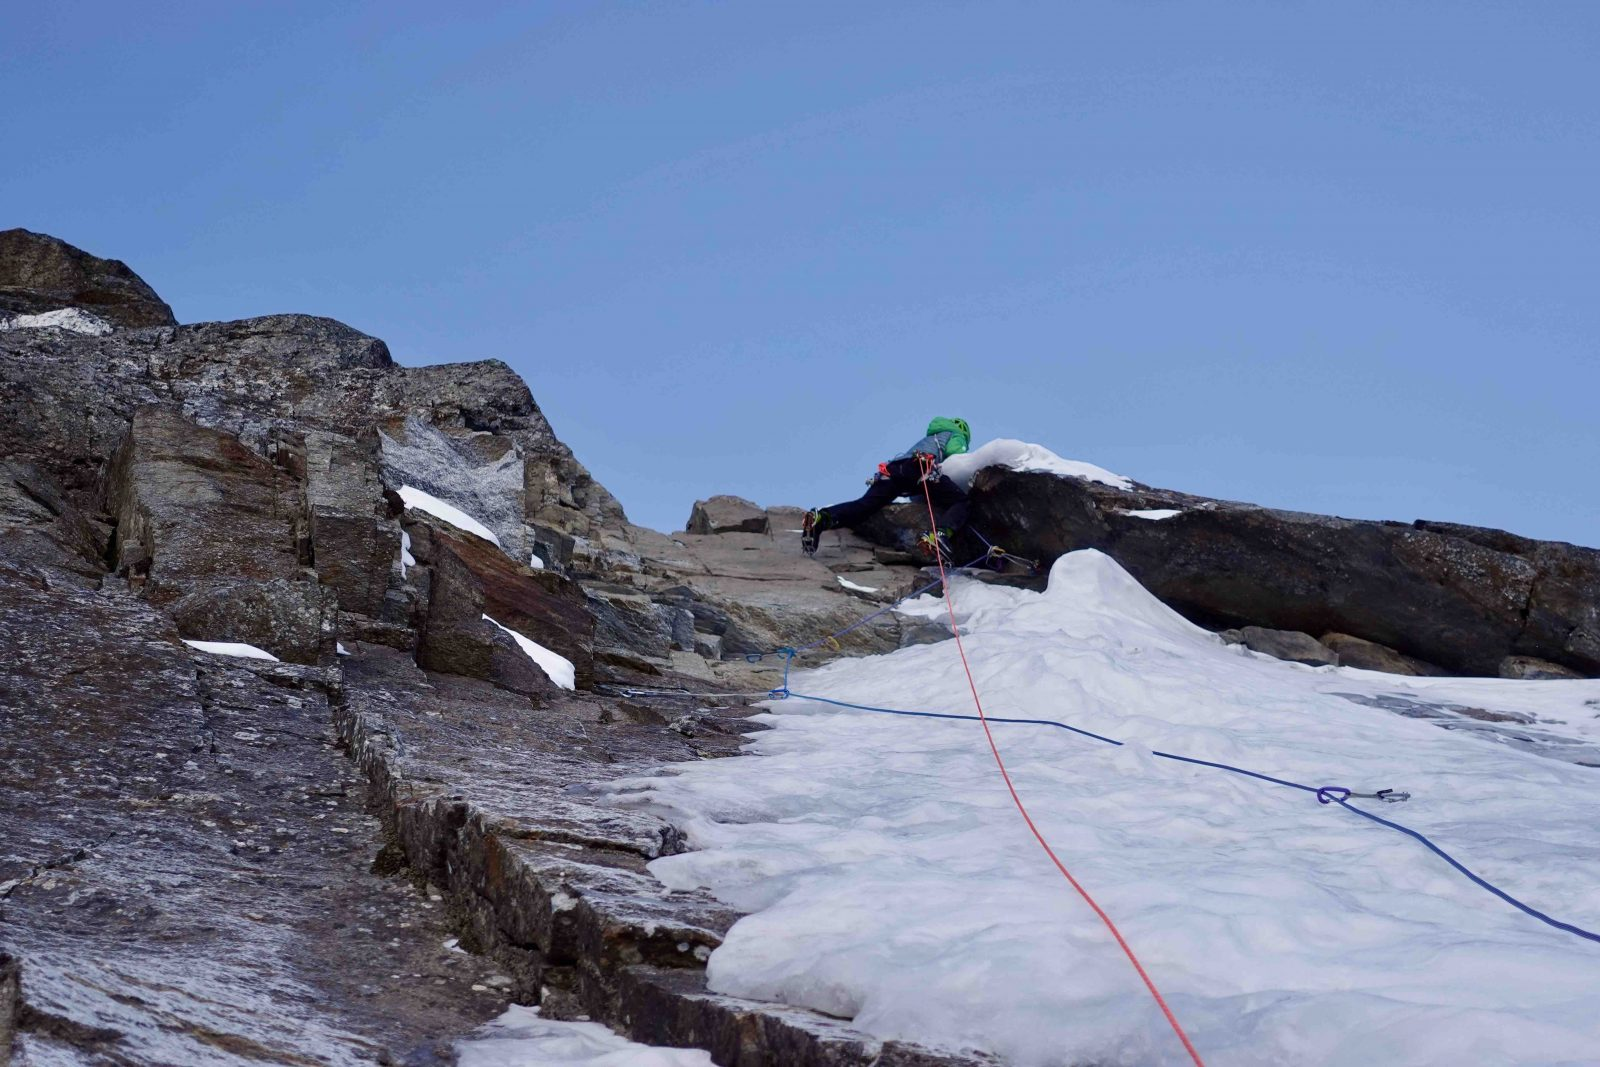 Sagwand-Nordwand, Winterbegehung, genug Risse, um zu sichern, Foto: Ines Papert und Luka Lindič |Climbers Paradise